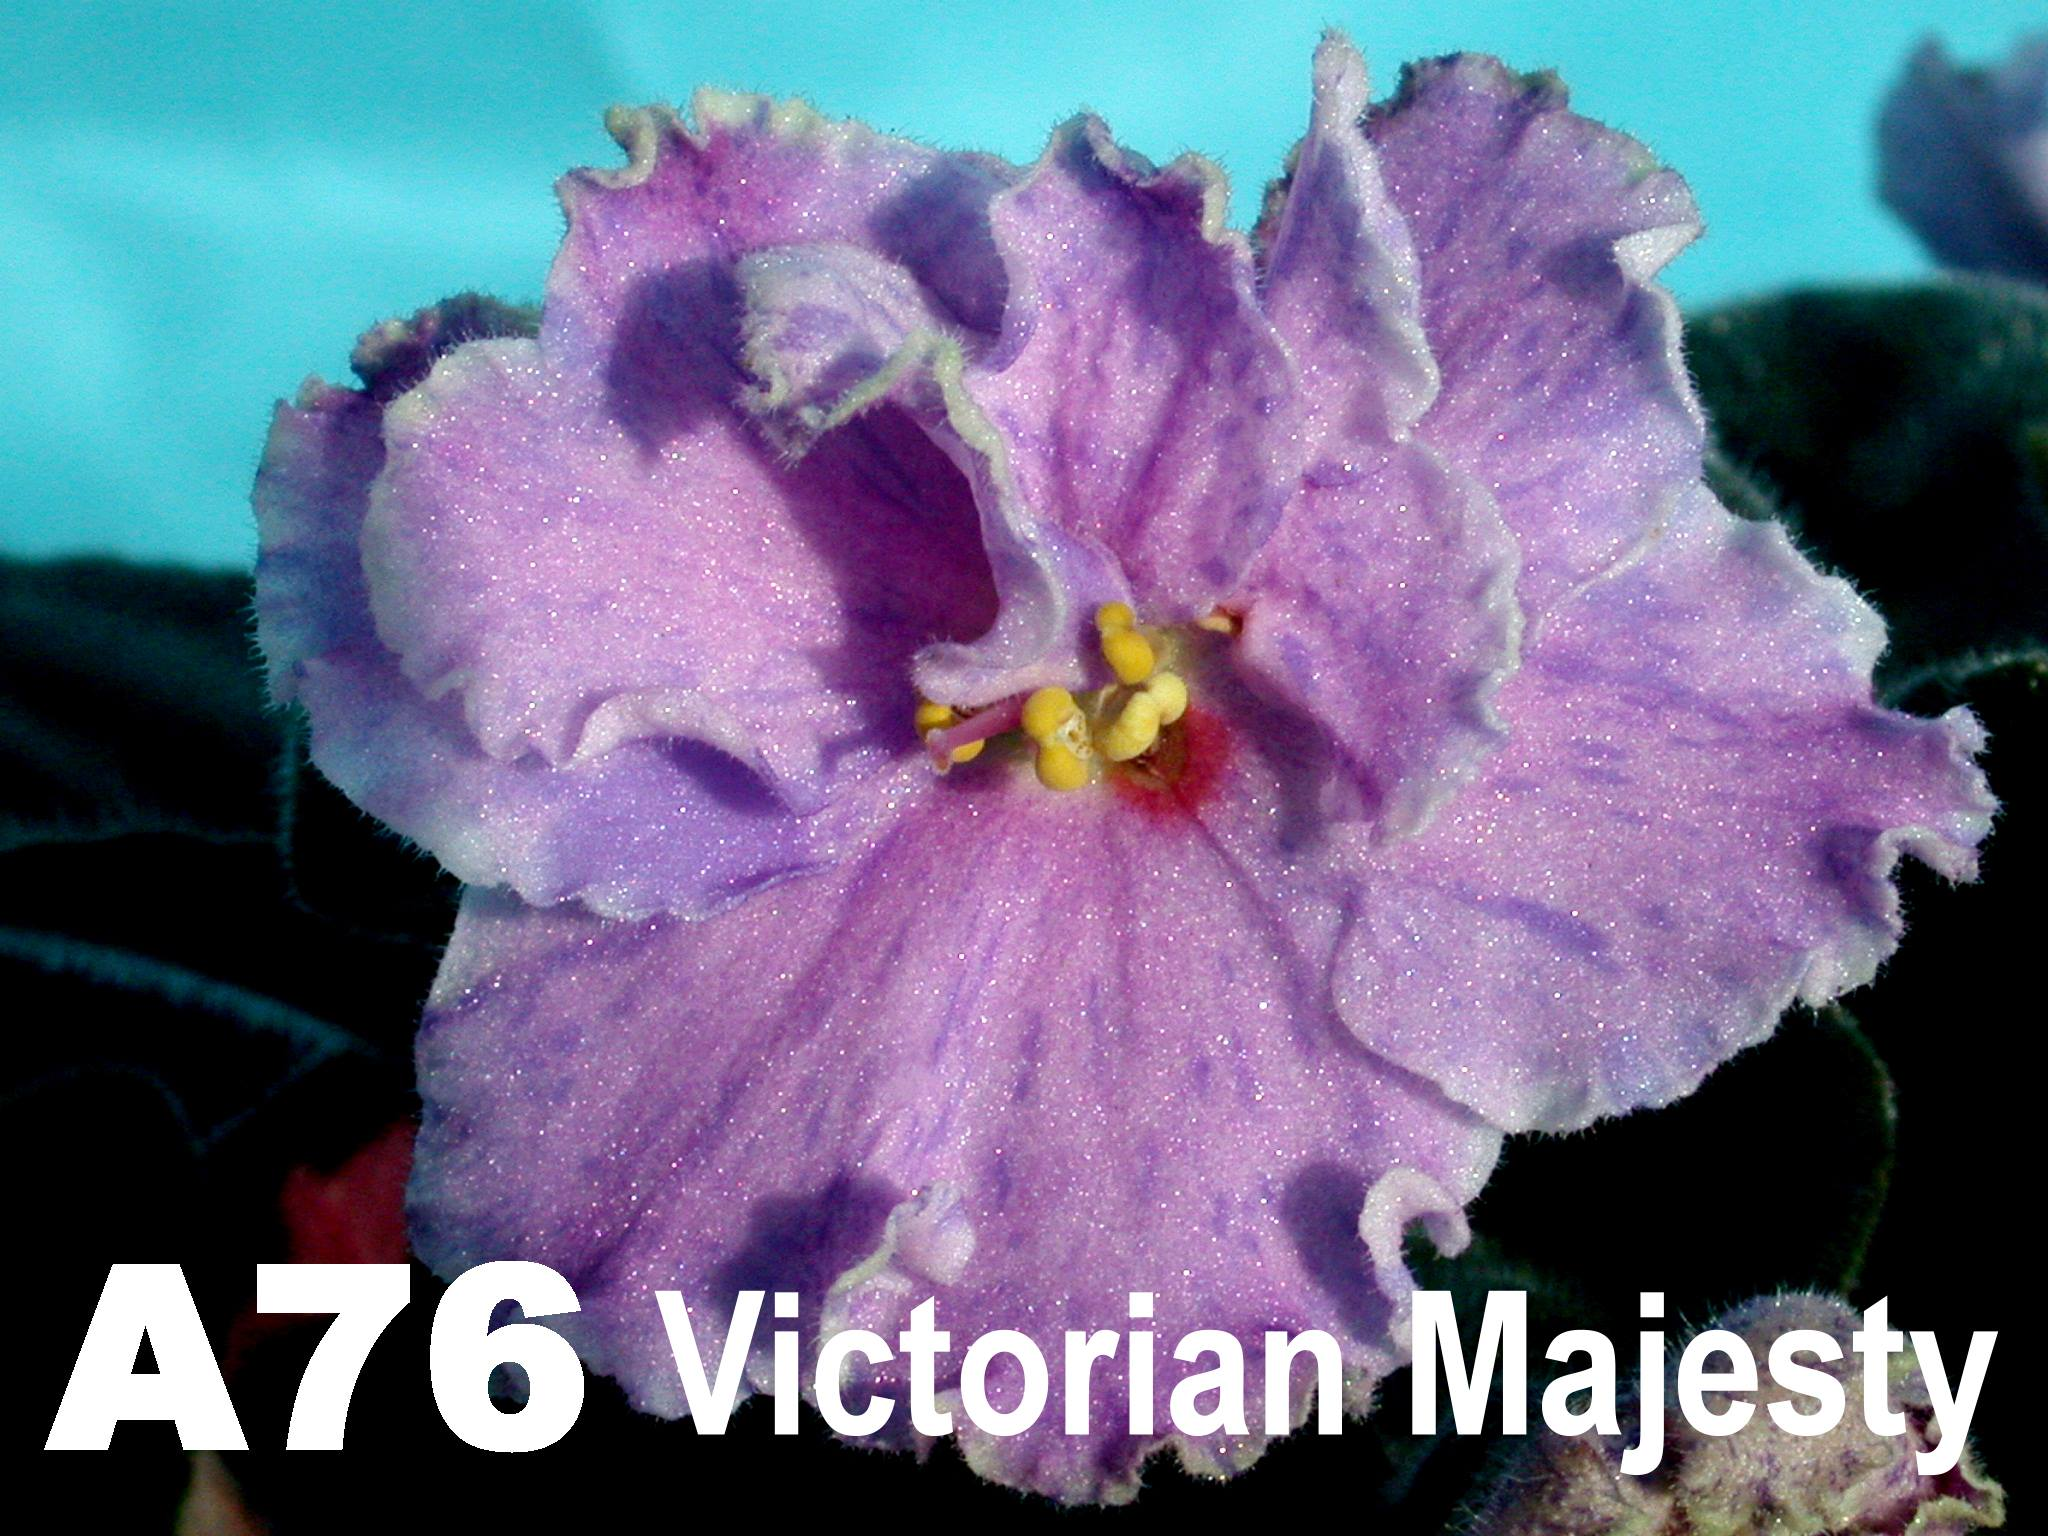 [A76] Victorian Majesty A76